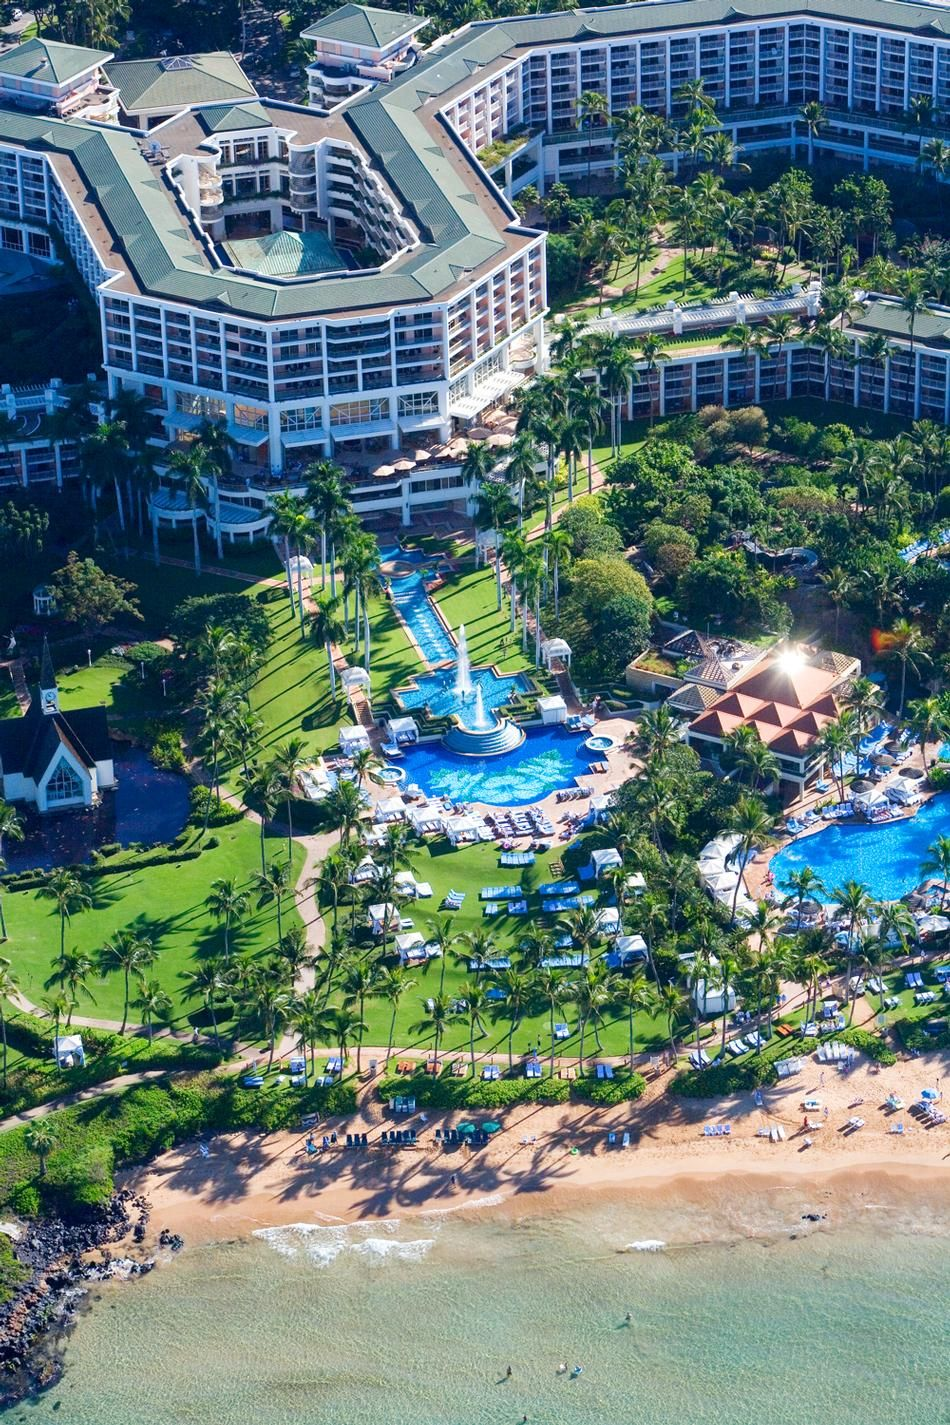 Grand Wailea Resort Maui Vacation Hawaii Vacation Best Romantic Getaways